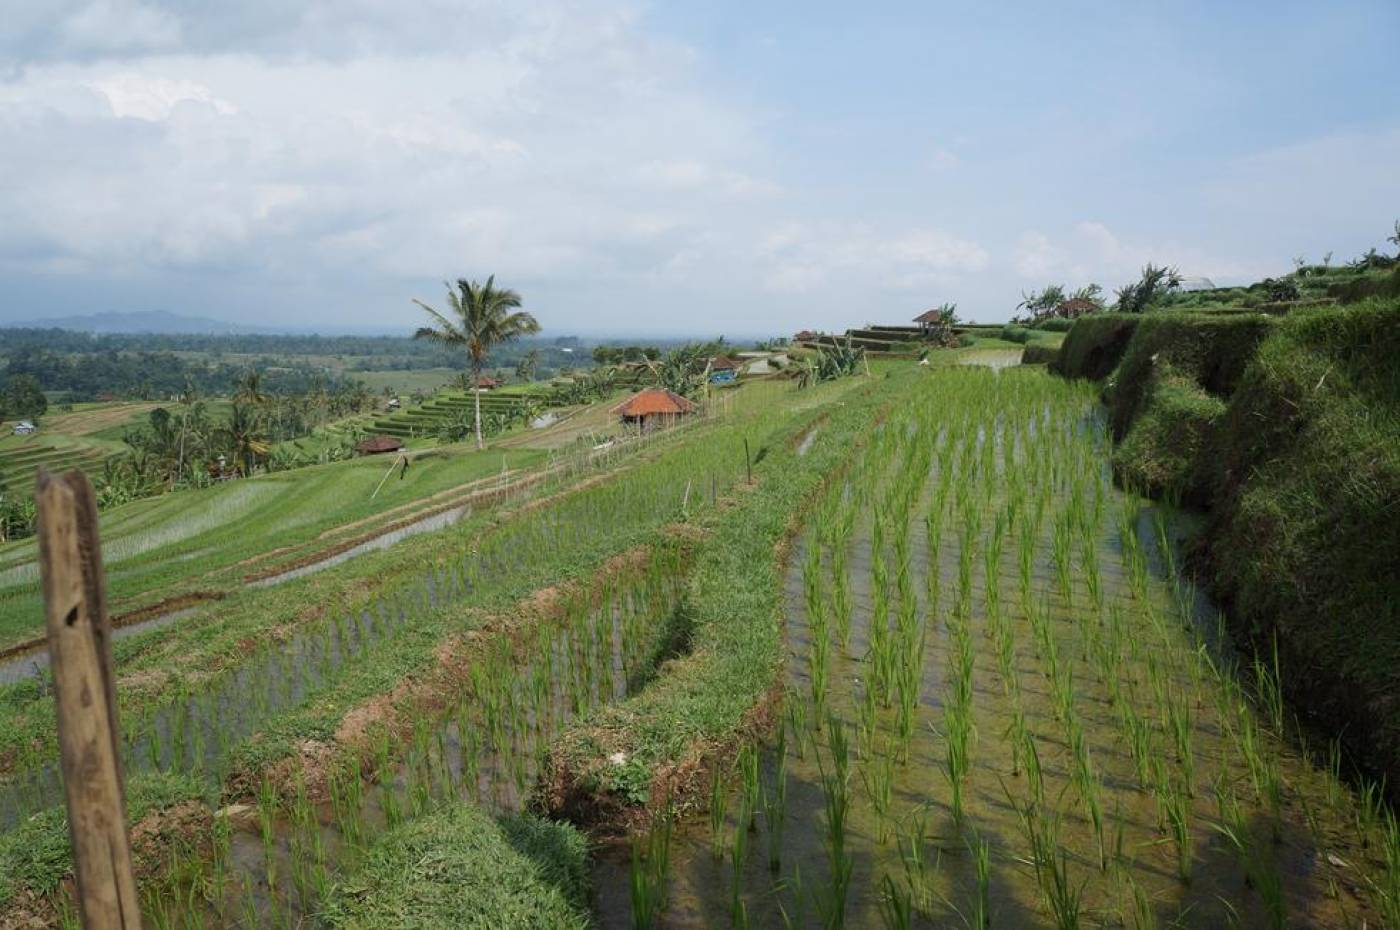 Bali wet rice terraces